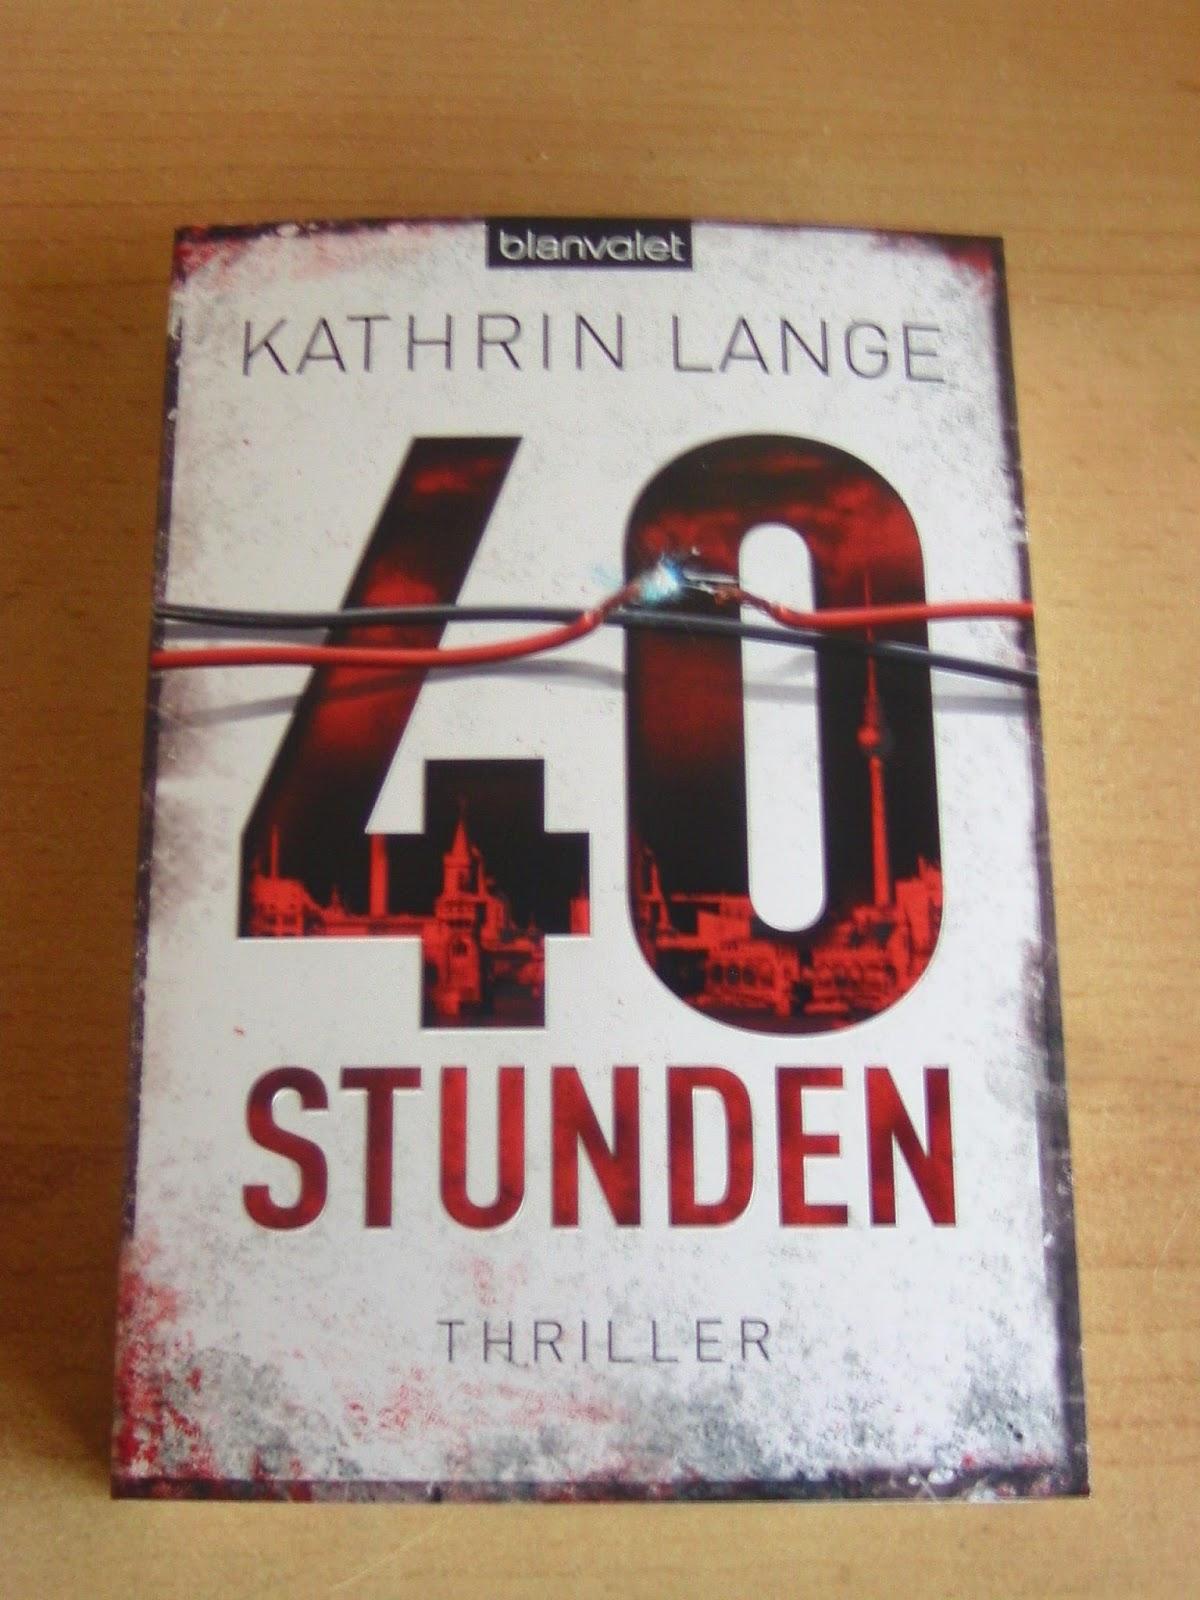 http://www.amazon.de/40-Stunden-Thriller-Kathrin-Lange-ebook/dp/B00GMH6X3S/ref=sr_1_1?s=books&ie=UTF8&qid=1412010583&sr=1-1&keywords=40+stunden